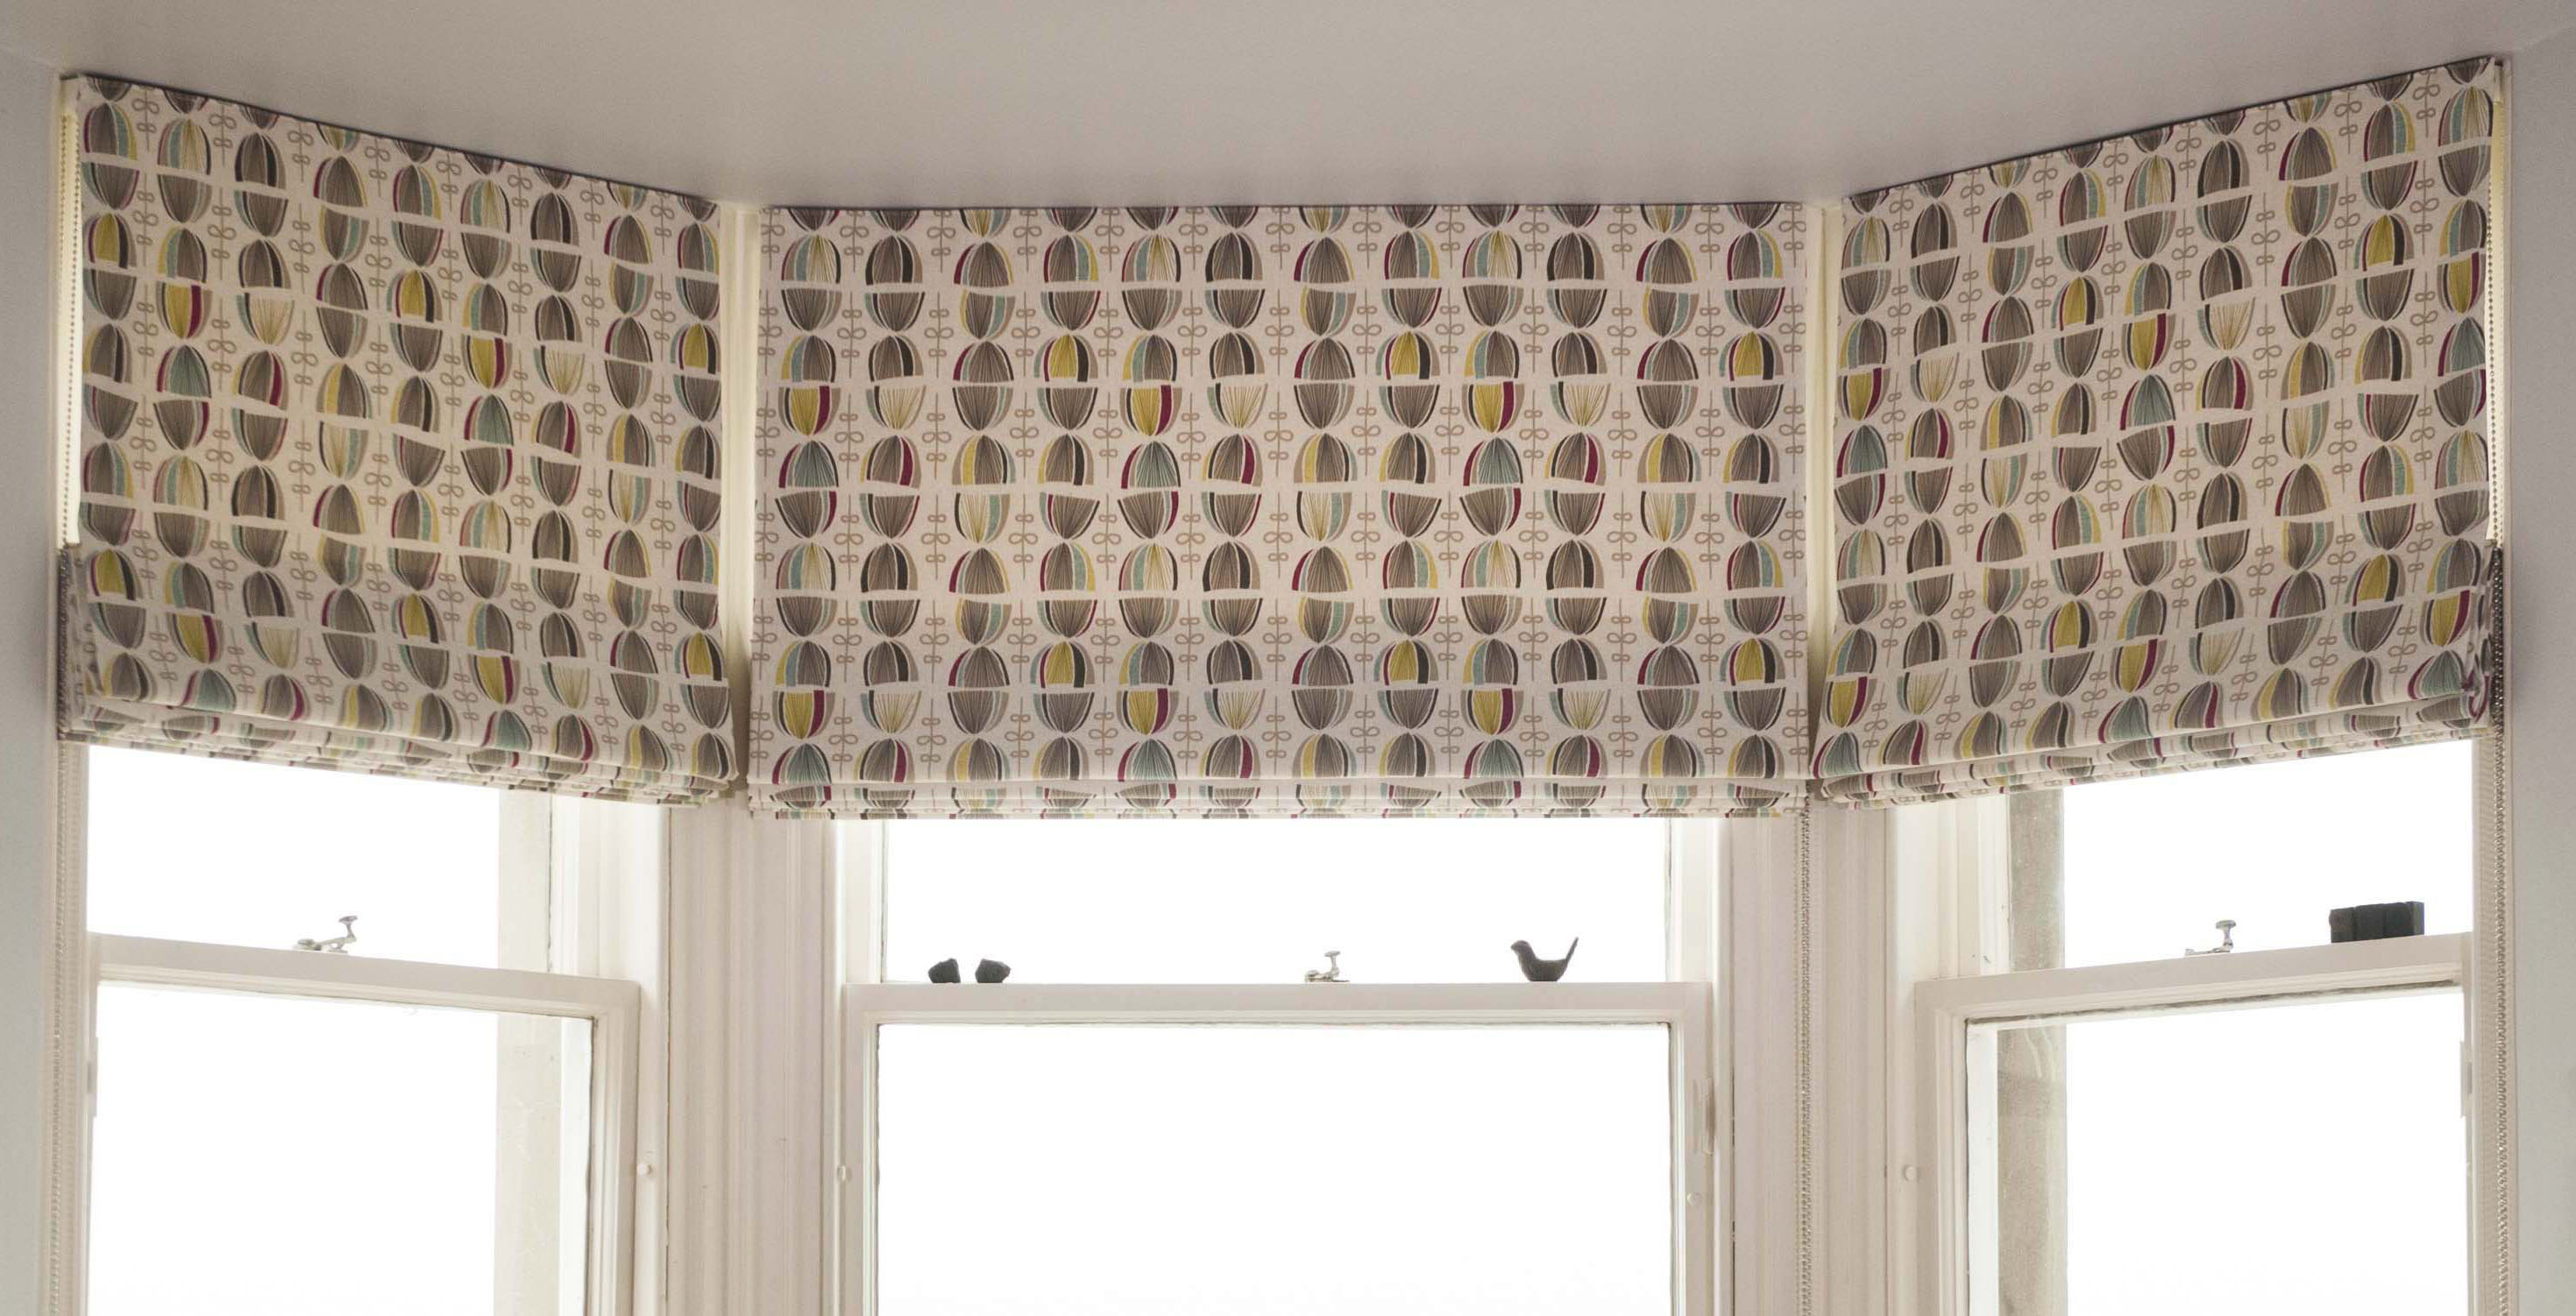 Roman blinds with custom fabric